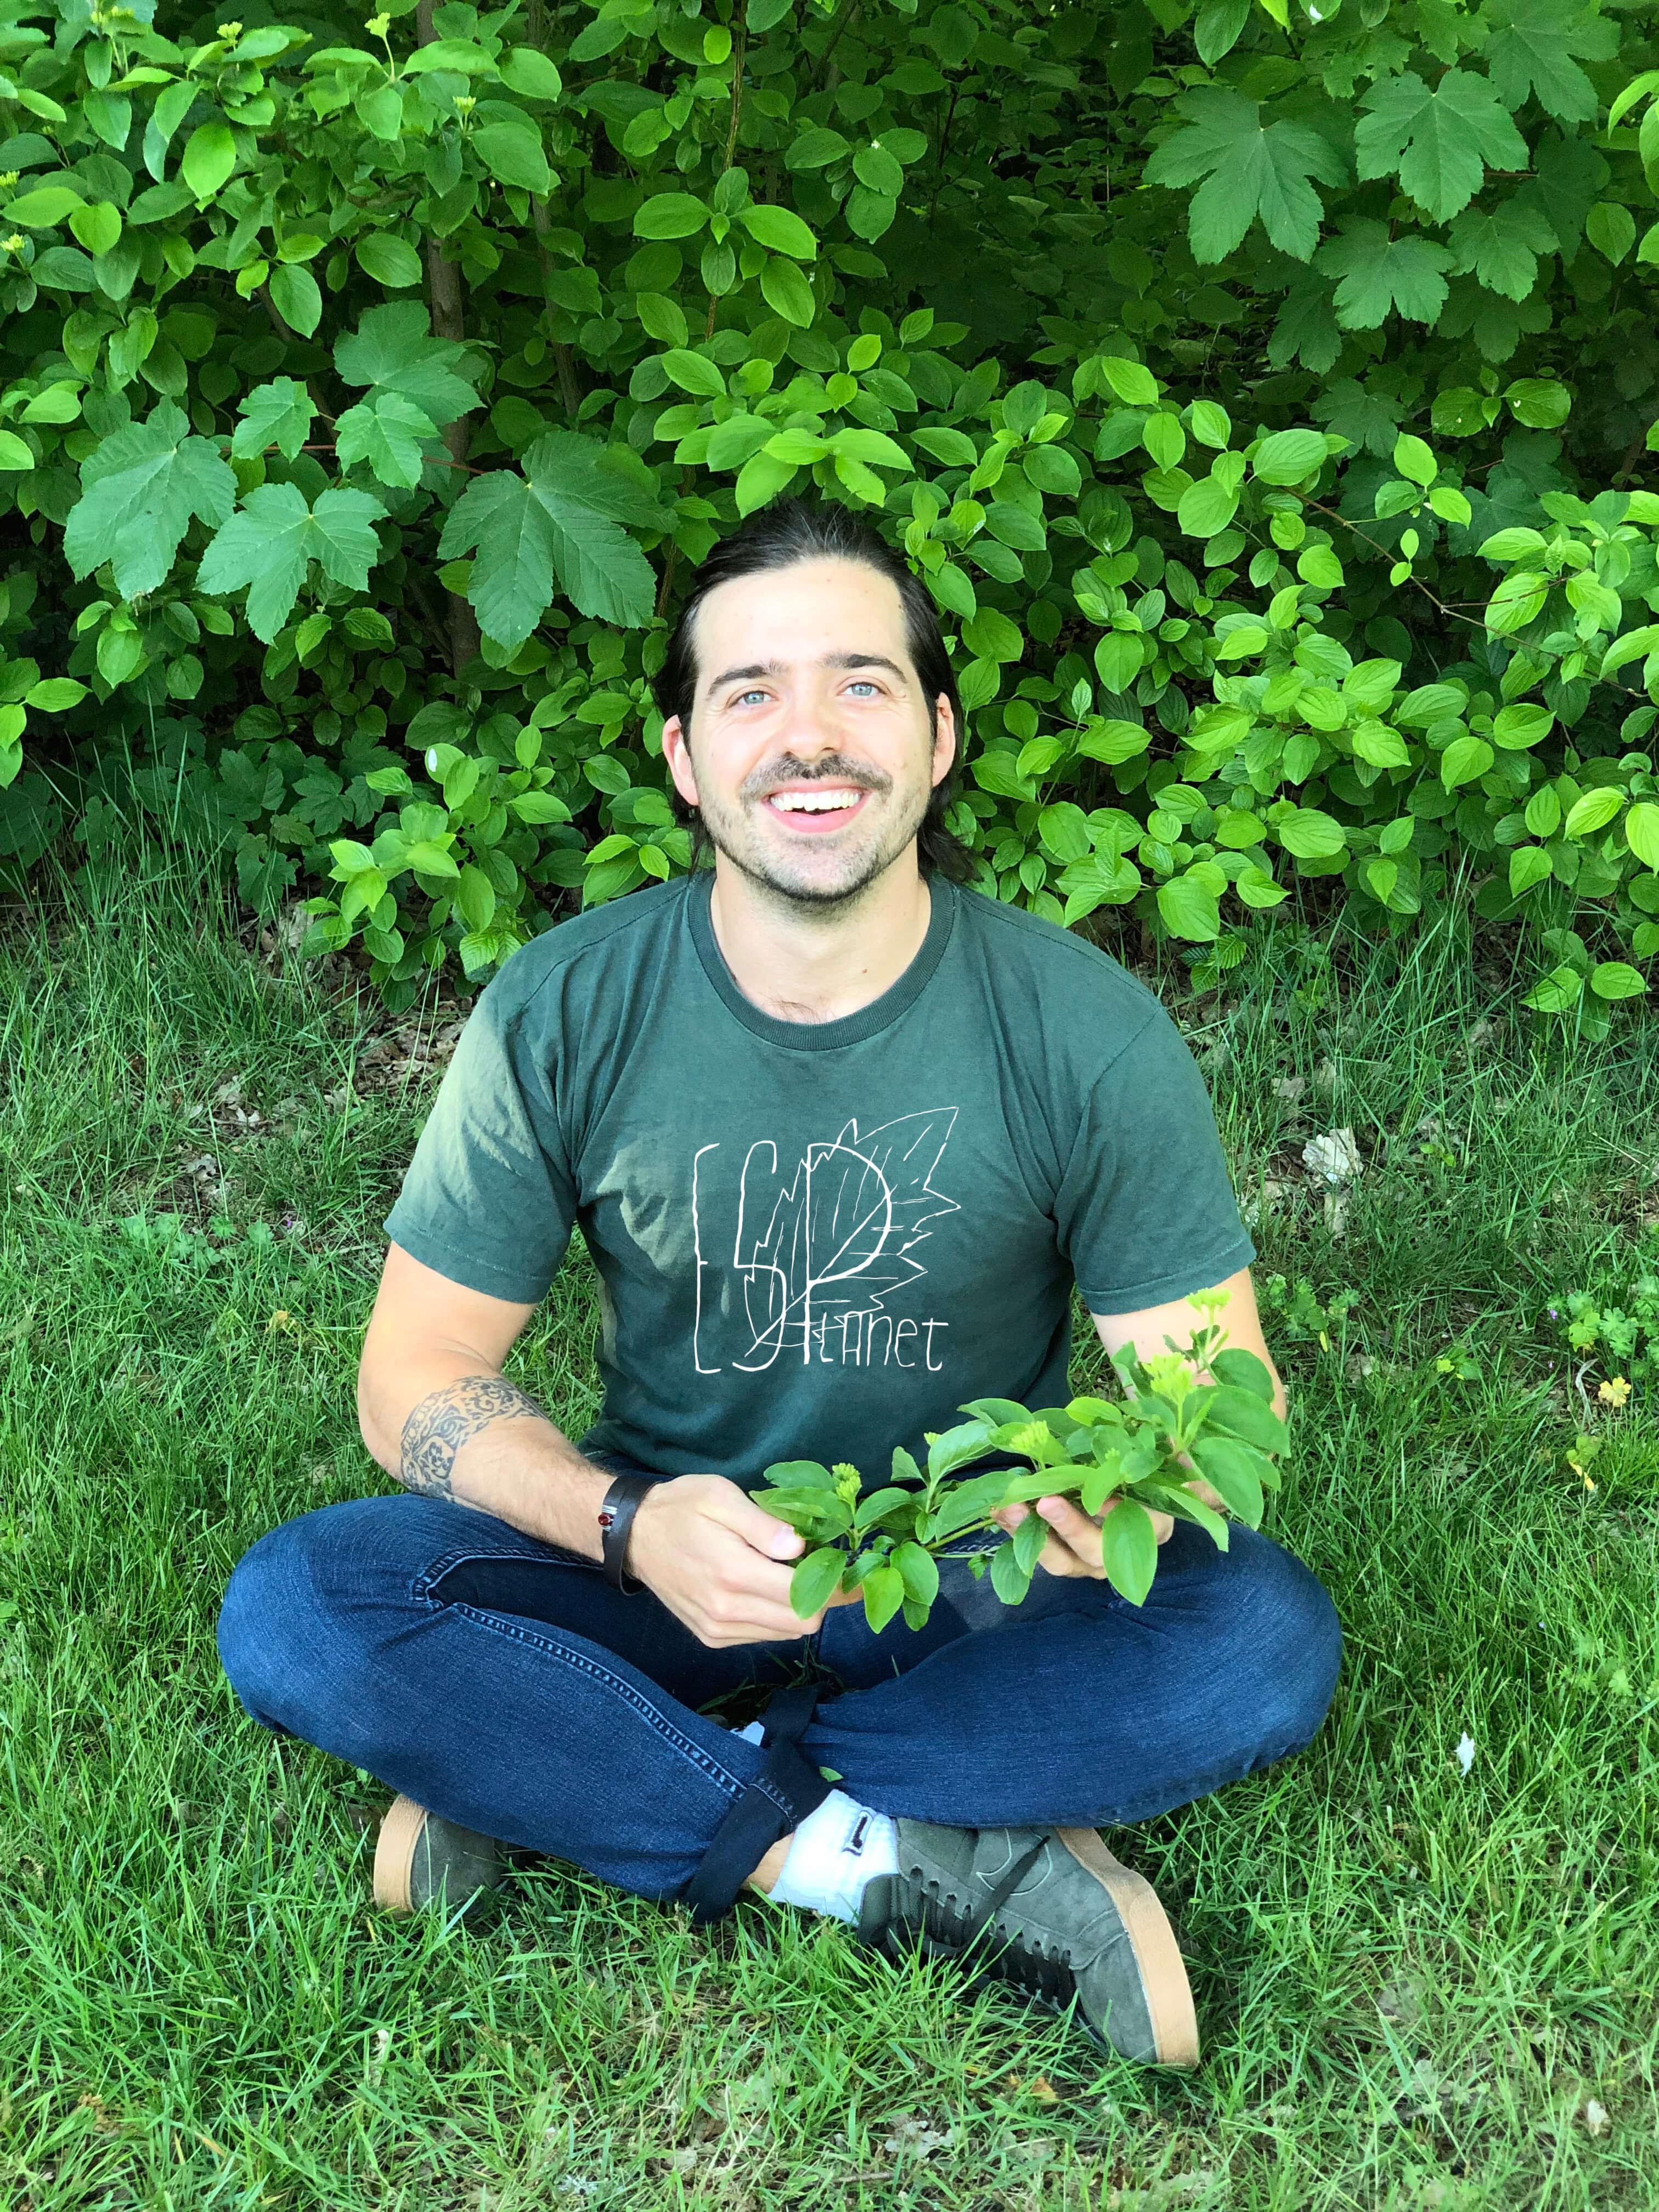 Patrick's story behind the ESPlanet shirts 6